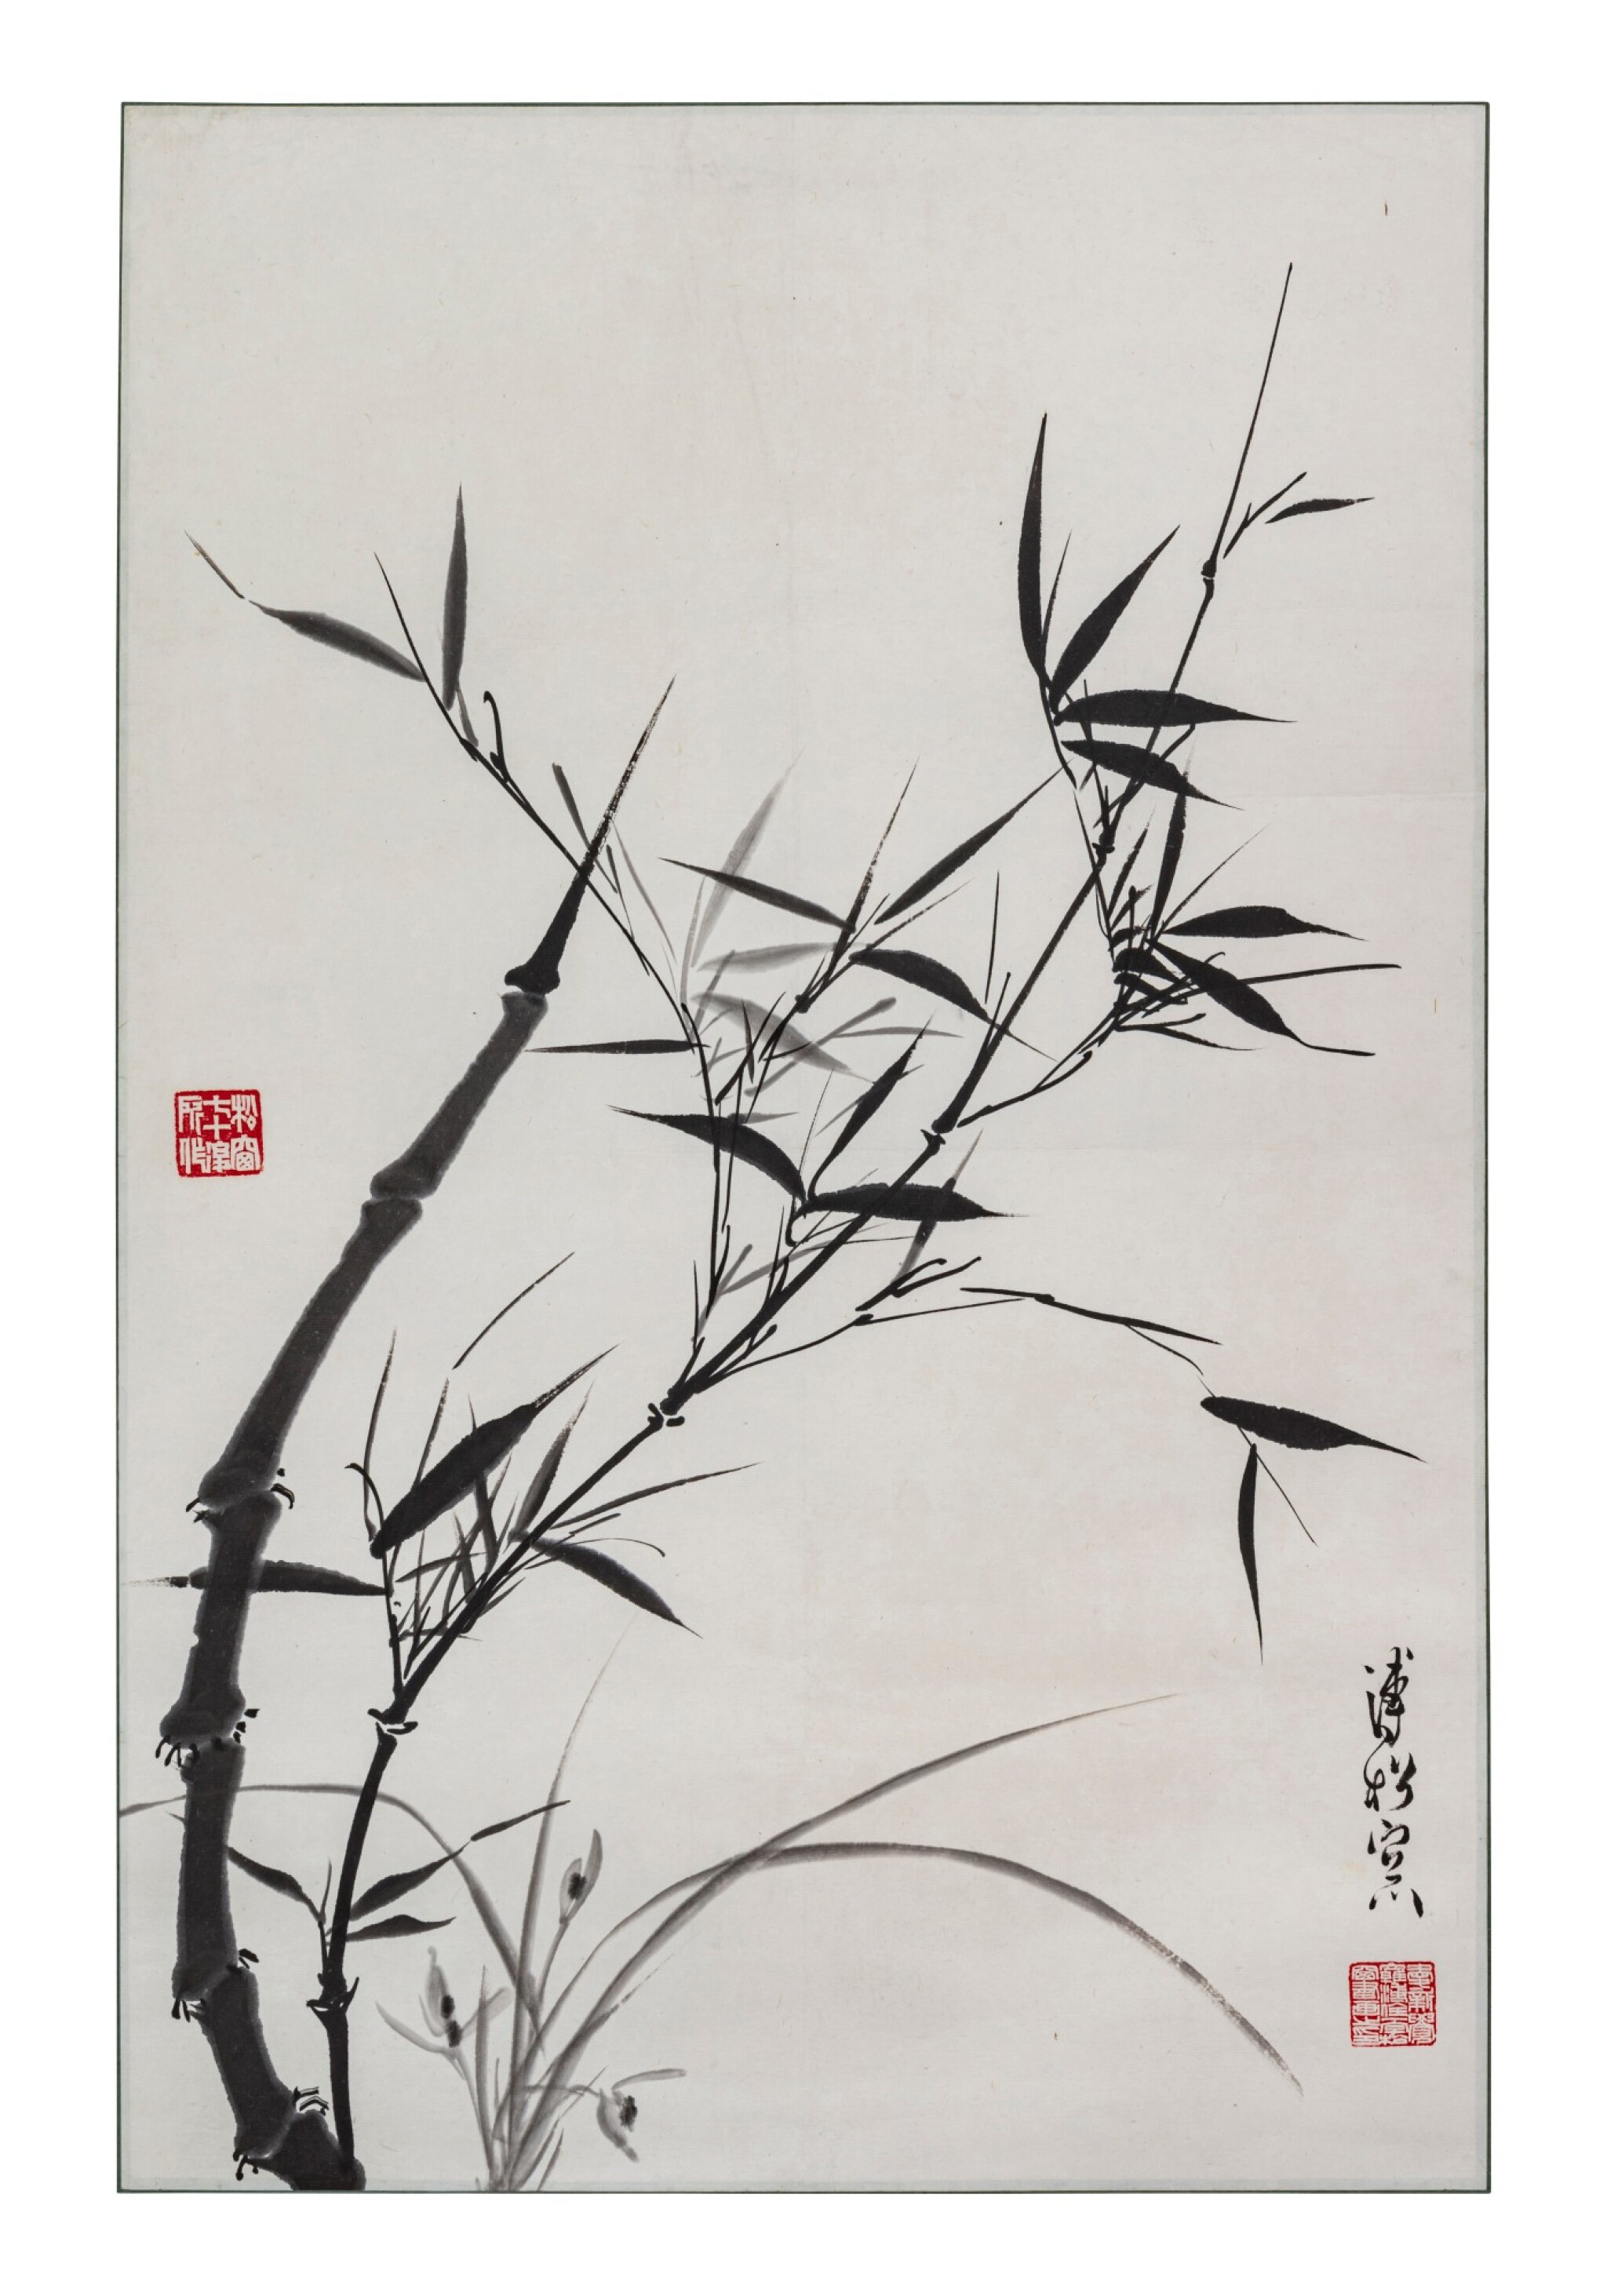 View 1 of Lot 126. Artistes variés Ensemble de neuf peintures | 花鳥畫 一組九幀 | Various artists Set of Nine Paintings.